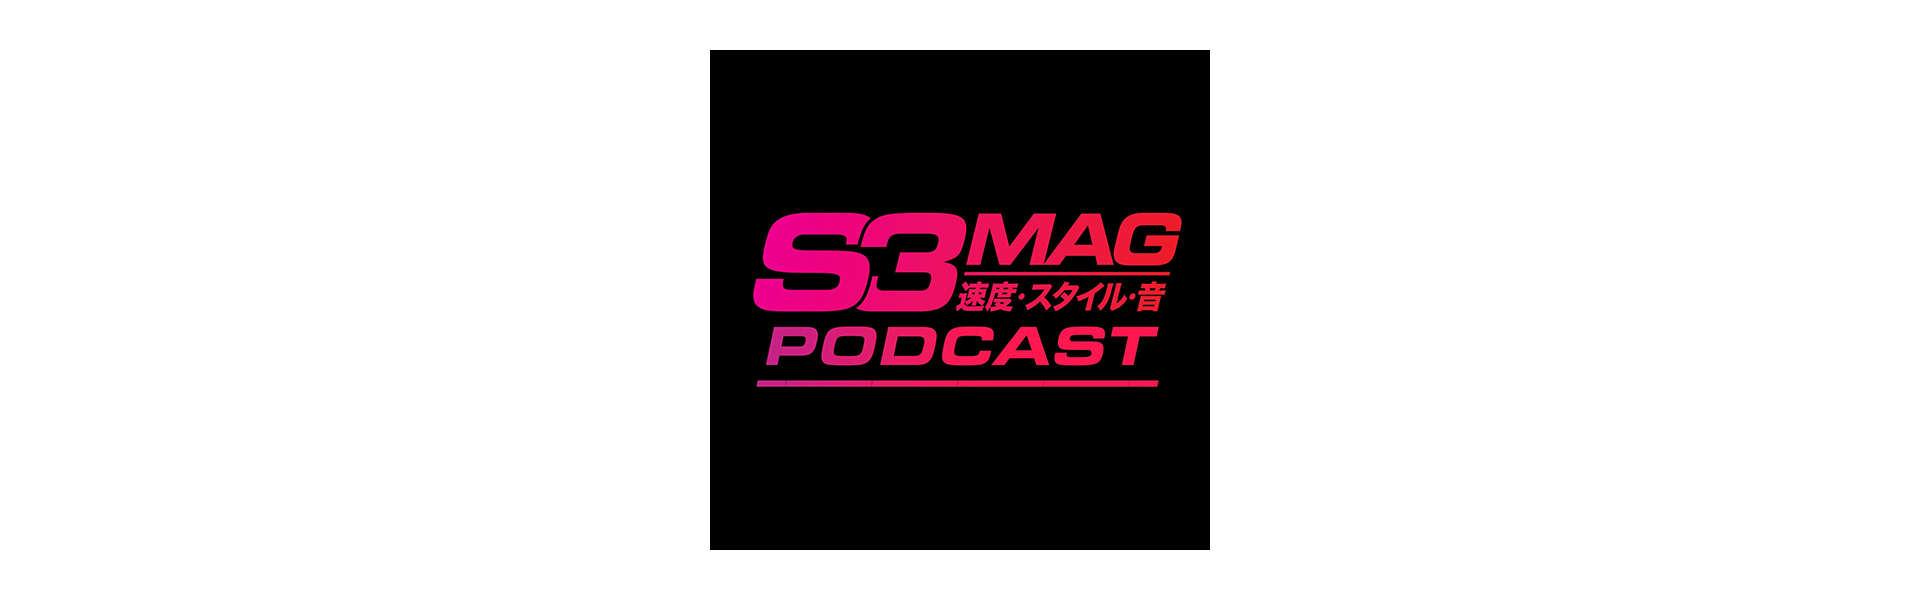 08_S3 Mag Podcast Logo